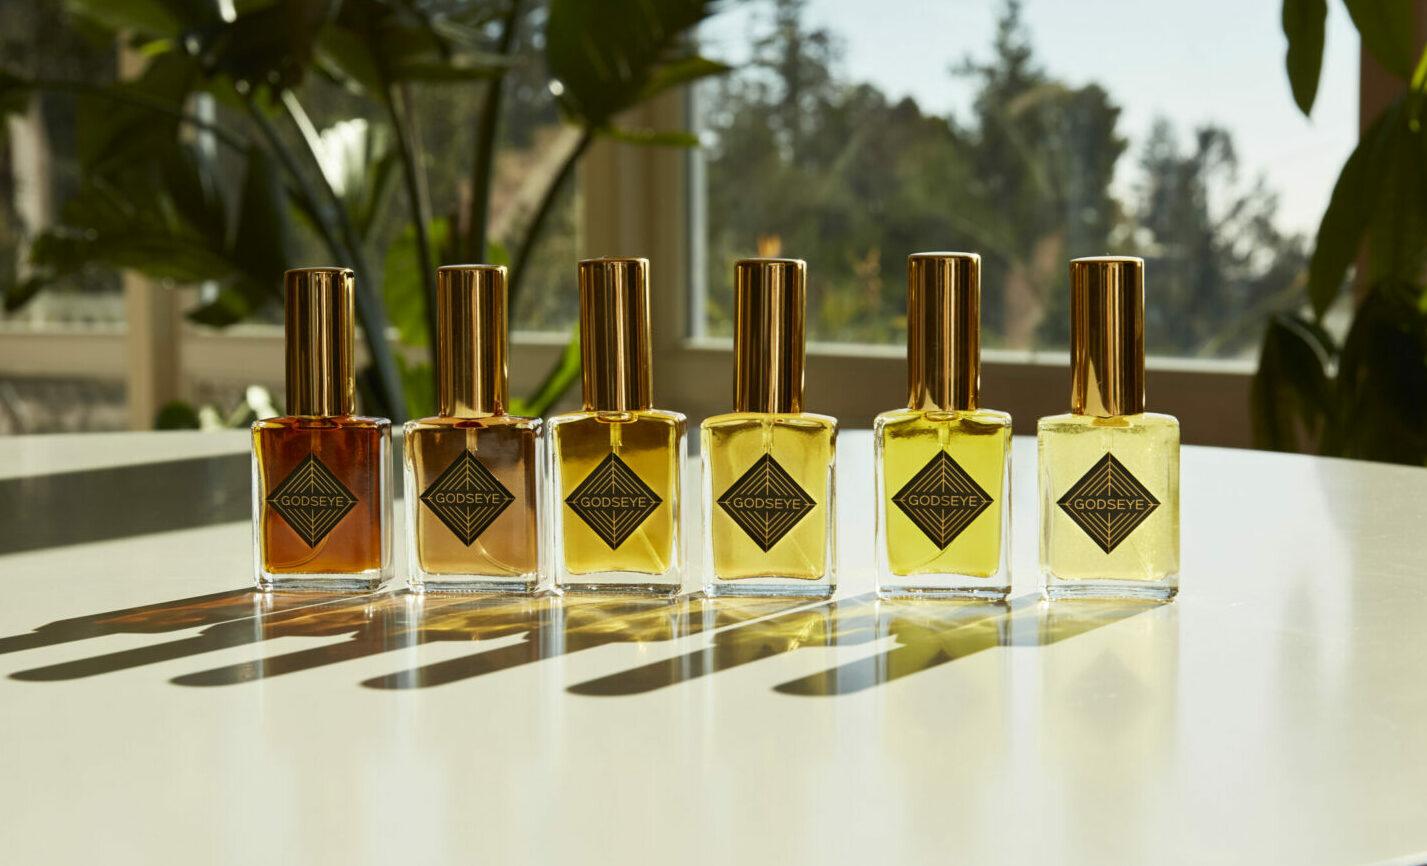 Perfumes by Godseye